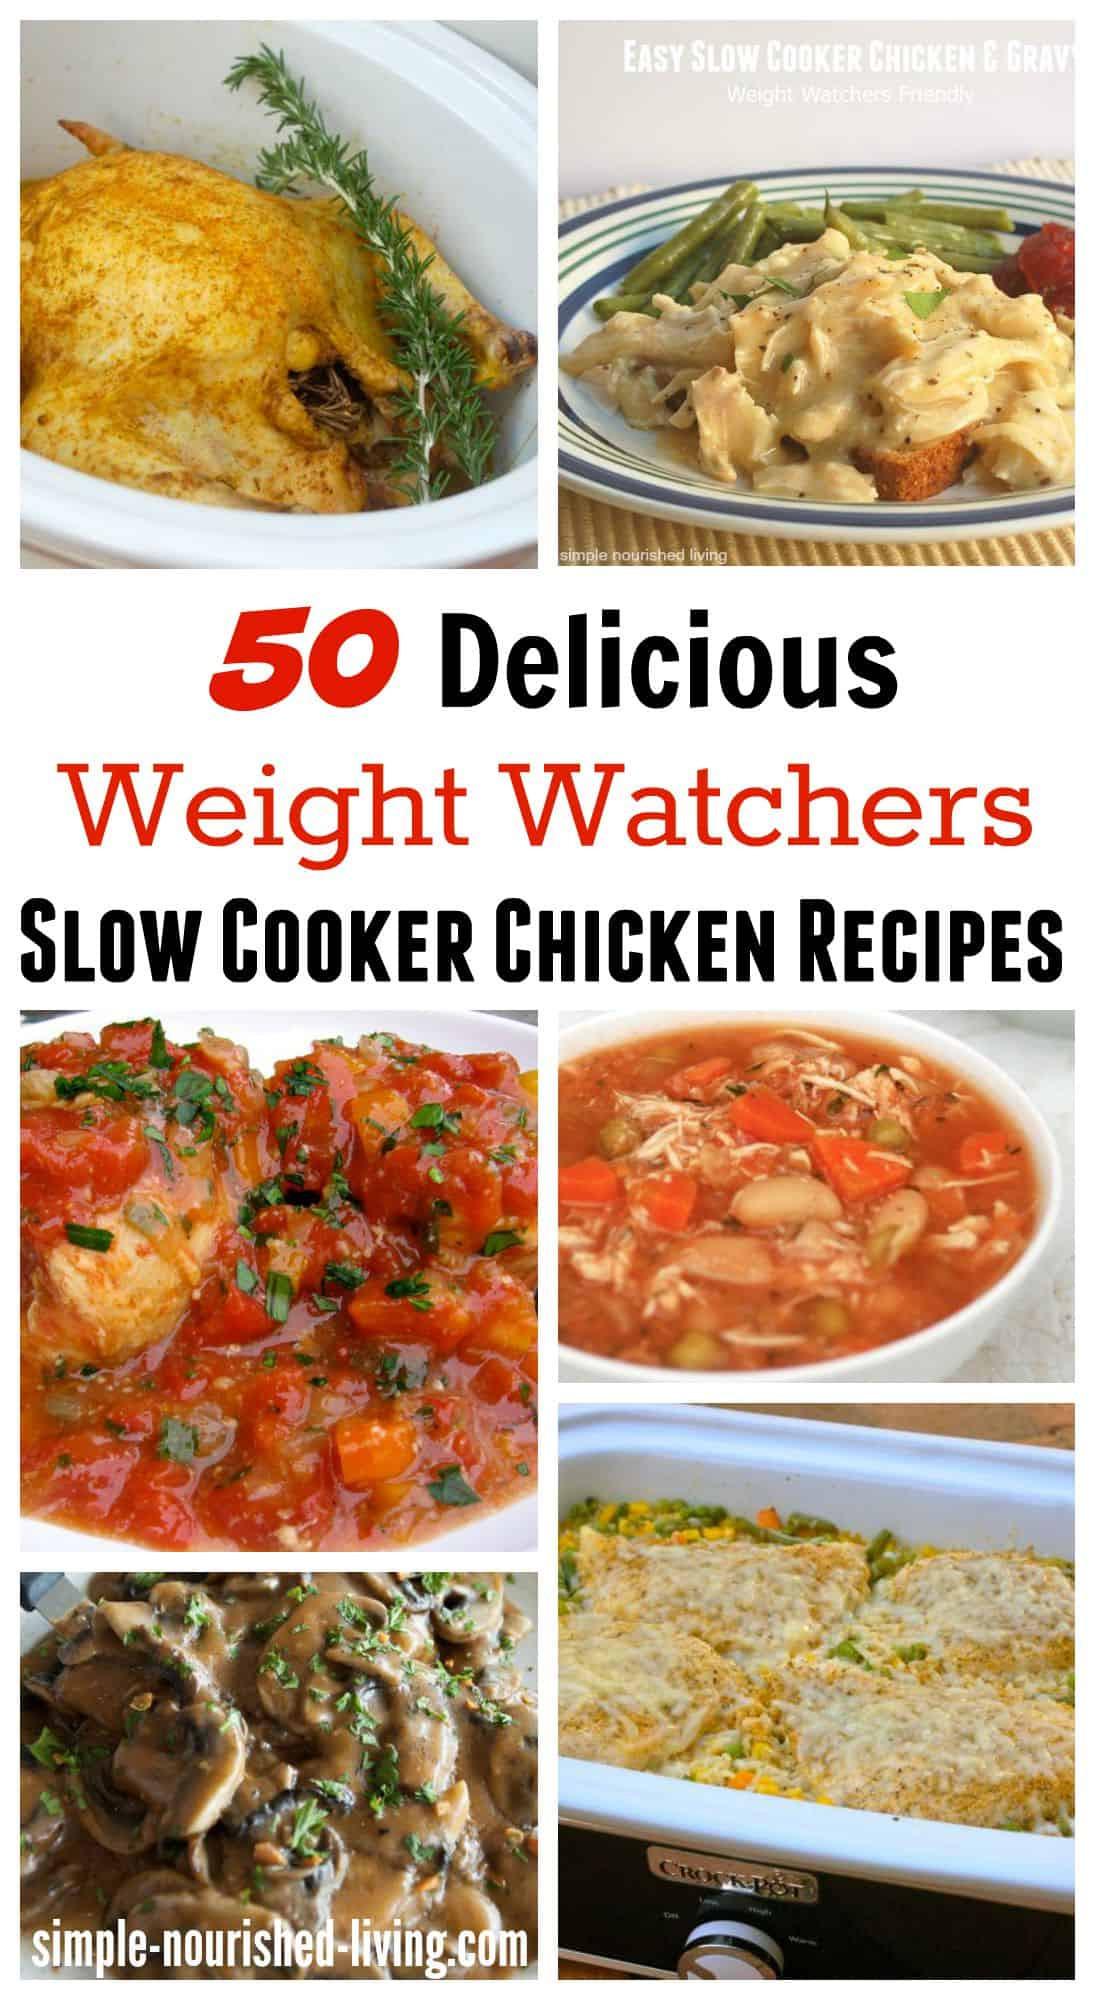 Slow Cooker Chicken Recipes Healthy  Healthy Slow Cooker Chicken Recipes for Weight Watchers